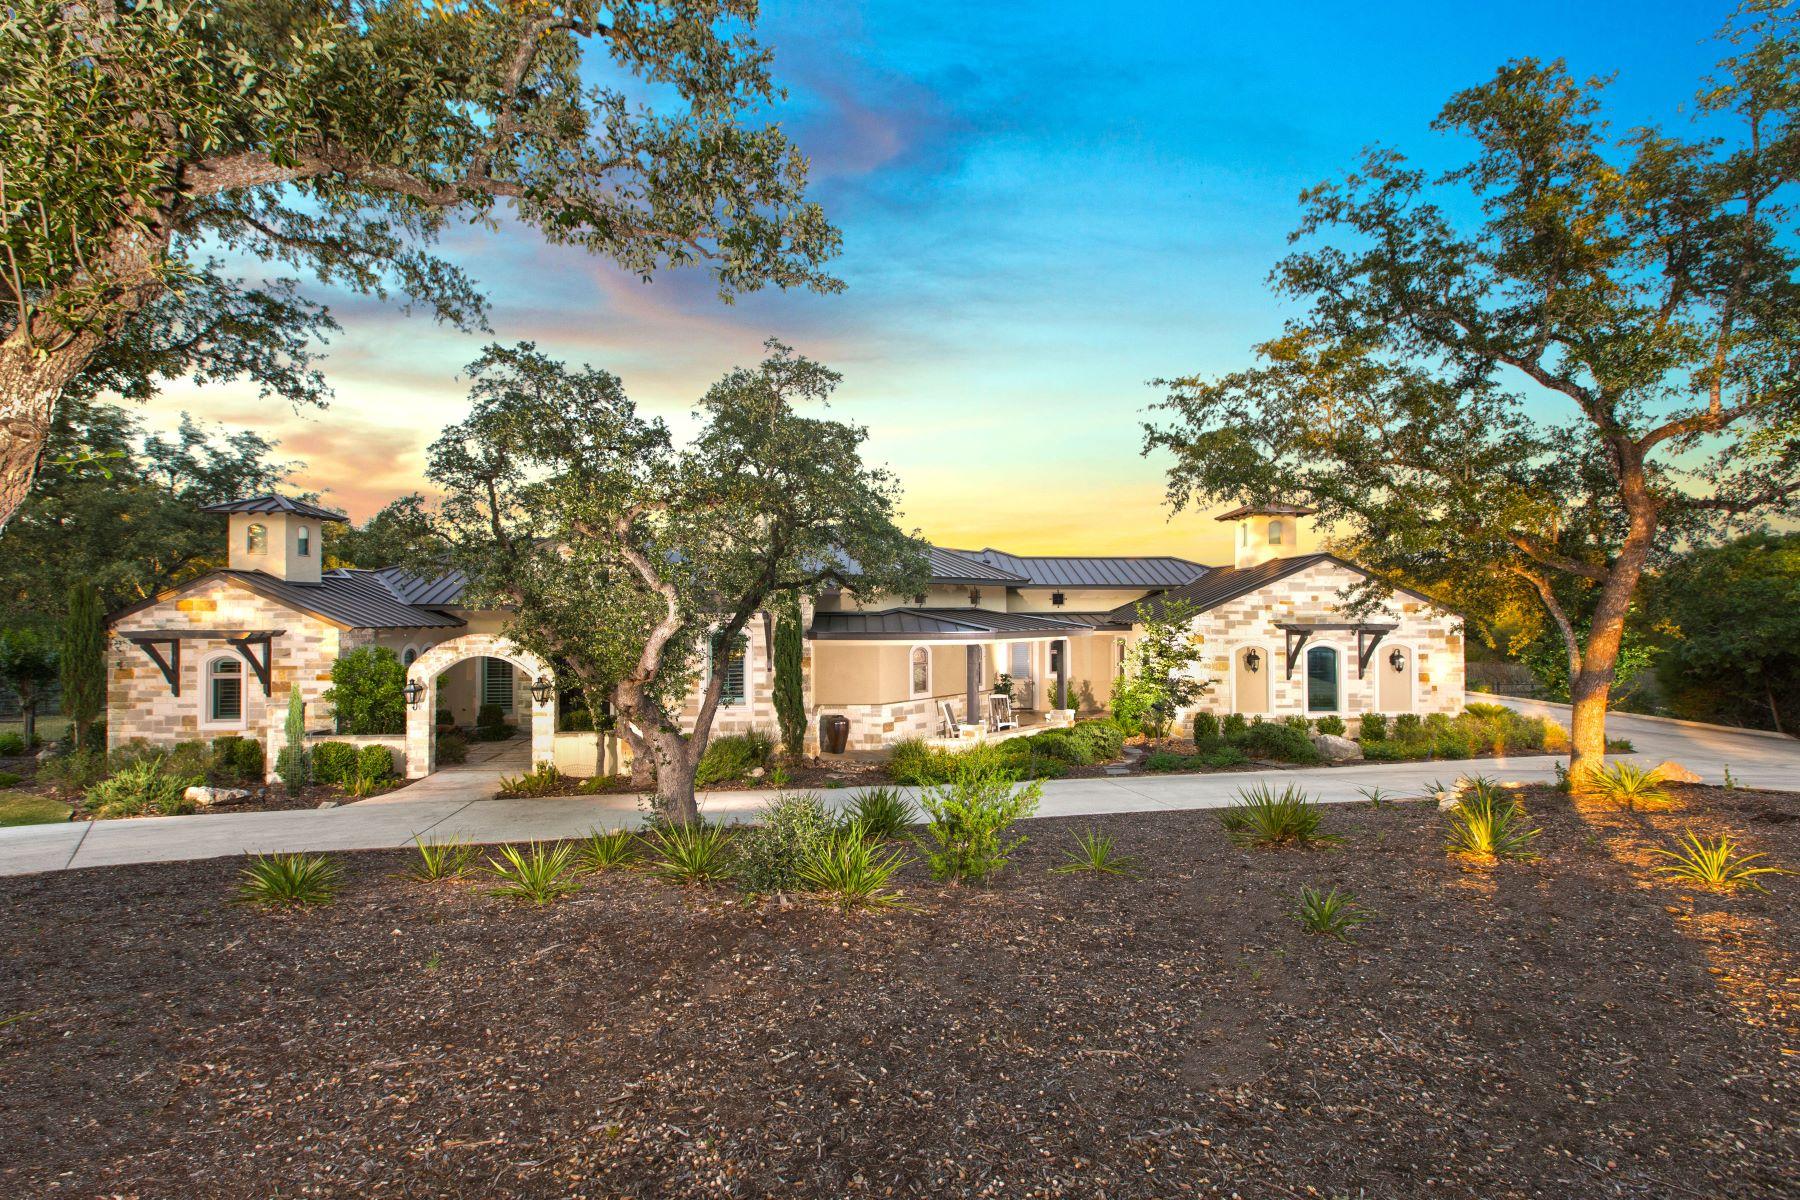 Single Family Homes por un Venta en Secluded Hill Country Retreat 11402 Anaqua Springs Boerne, Texas 78006 Estados Unidos